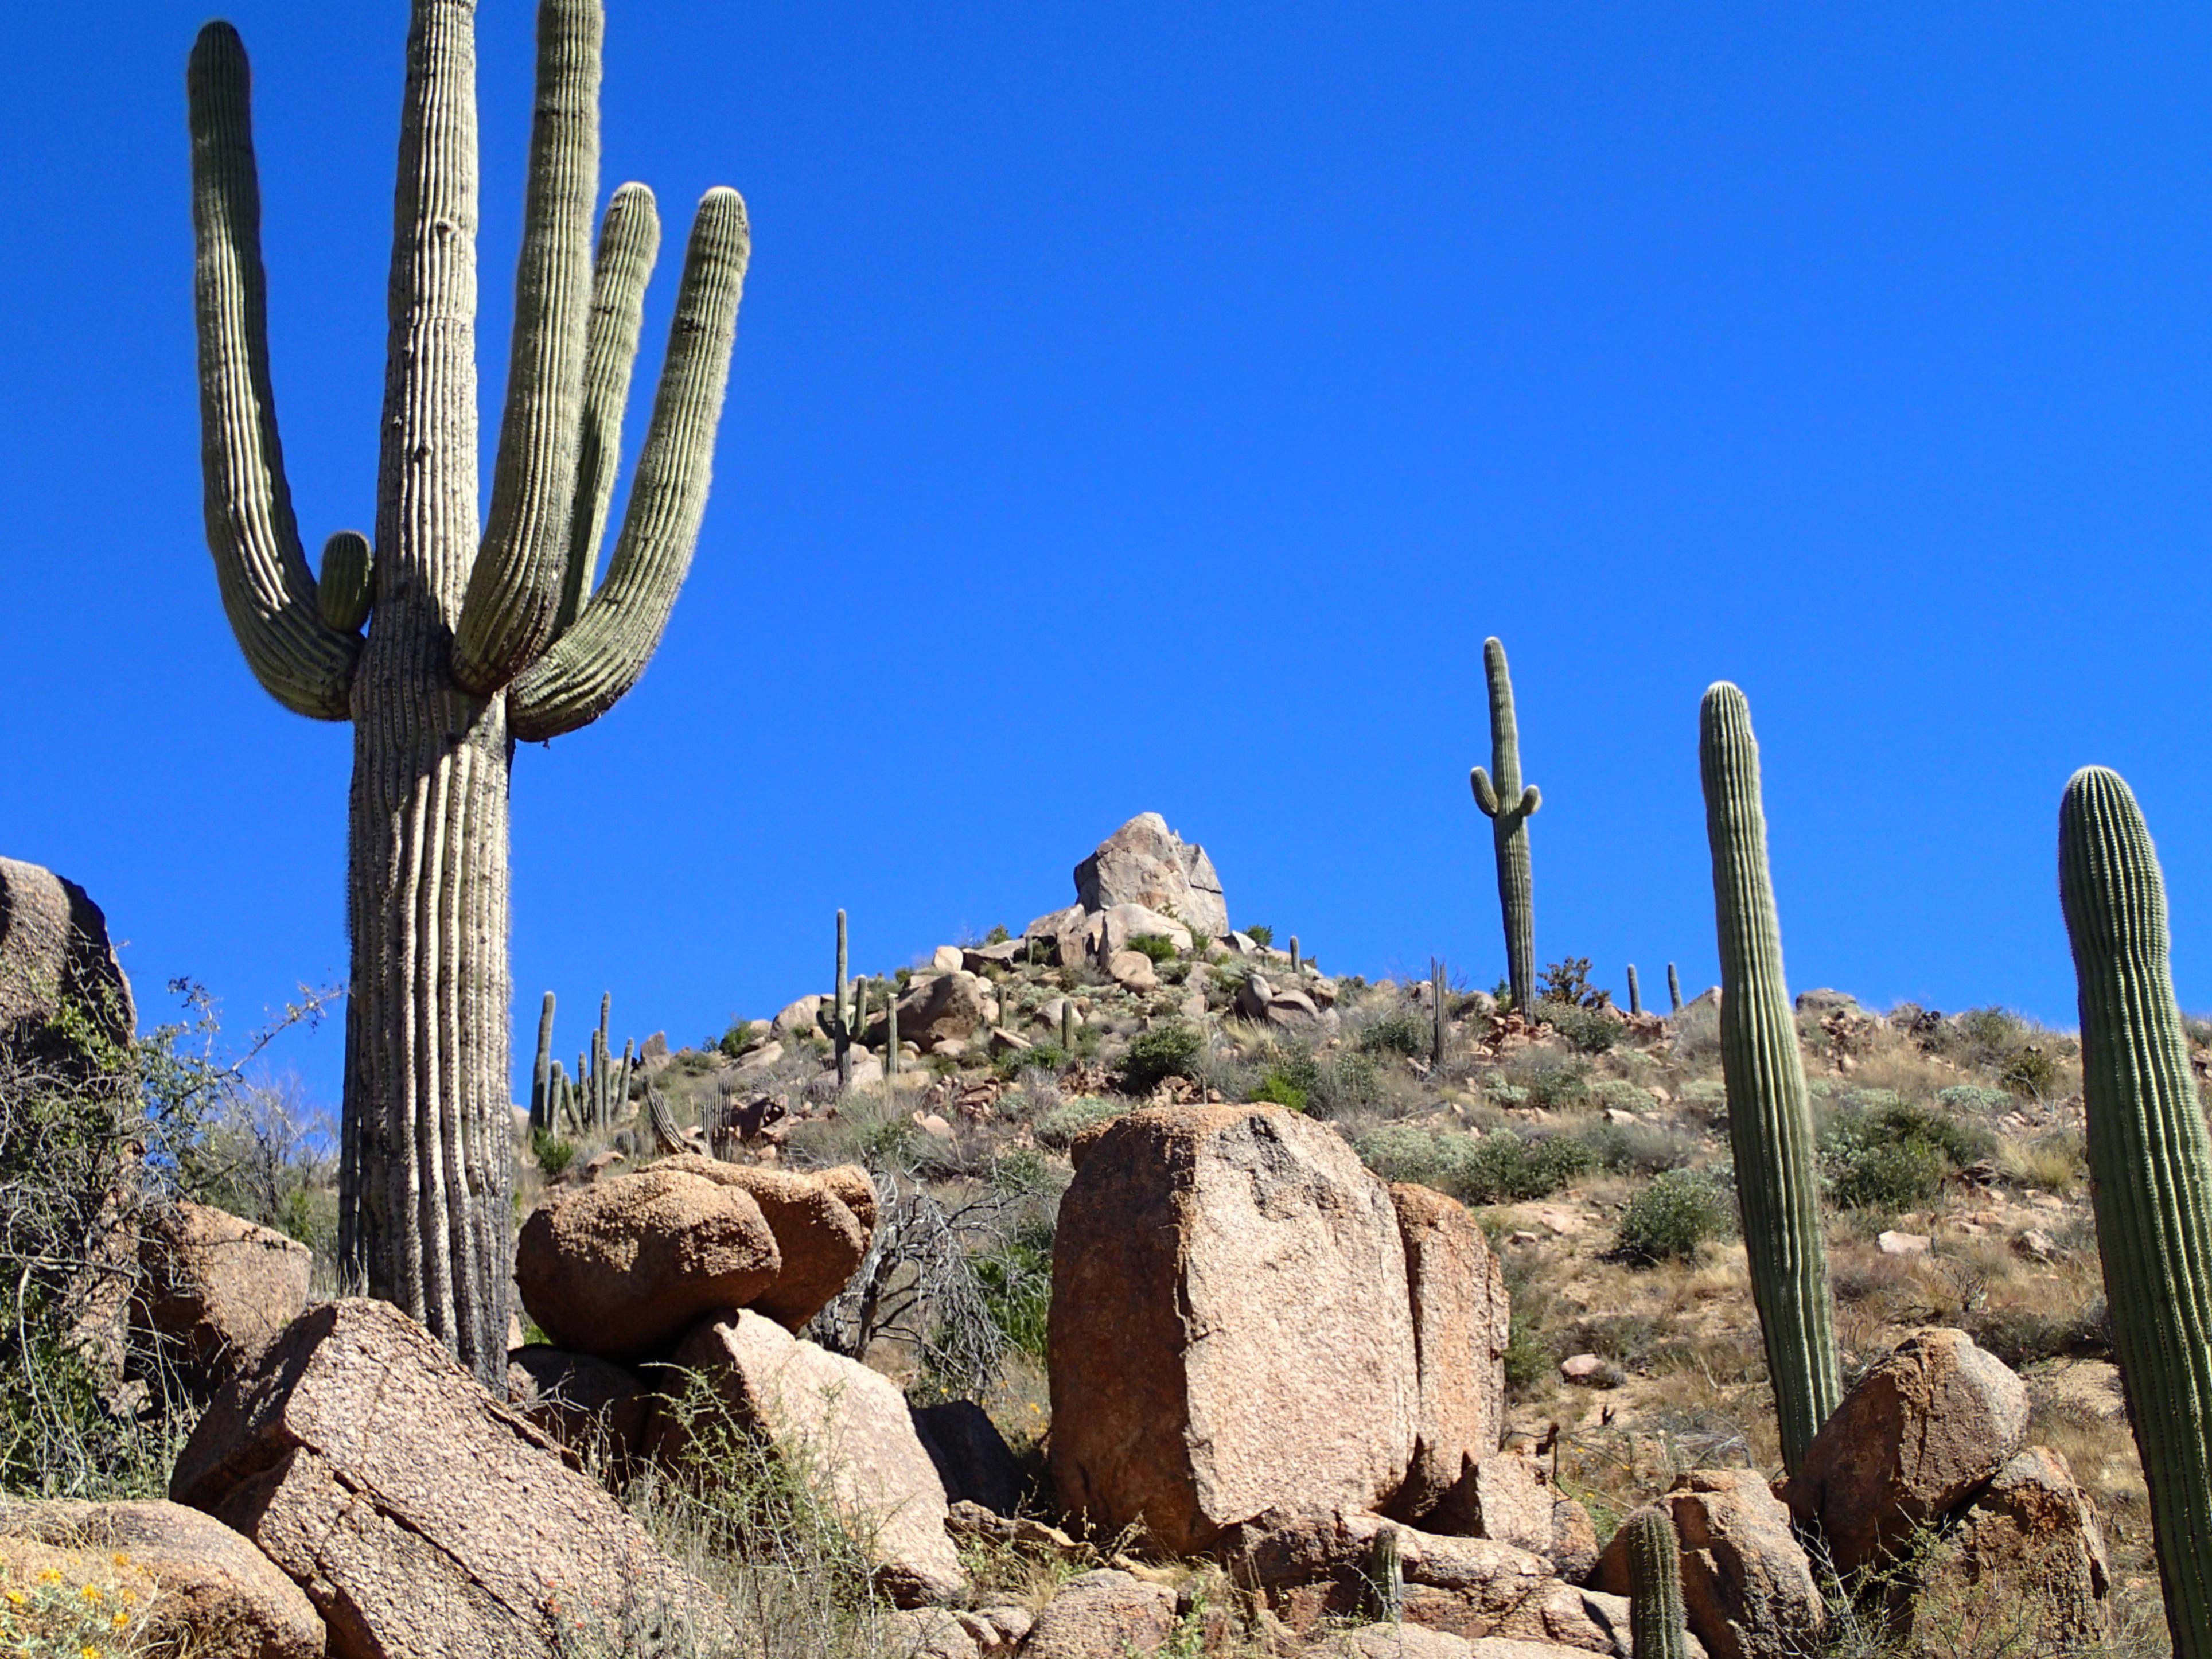 Fotos gratis paisaje rock cactus desierto flor for Fotos de cactus